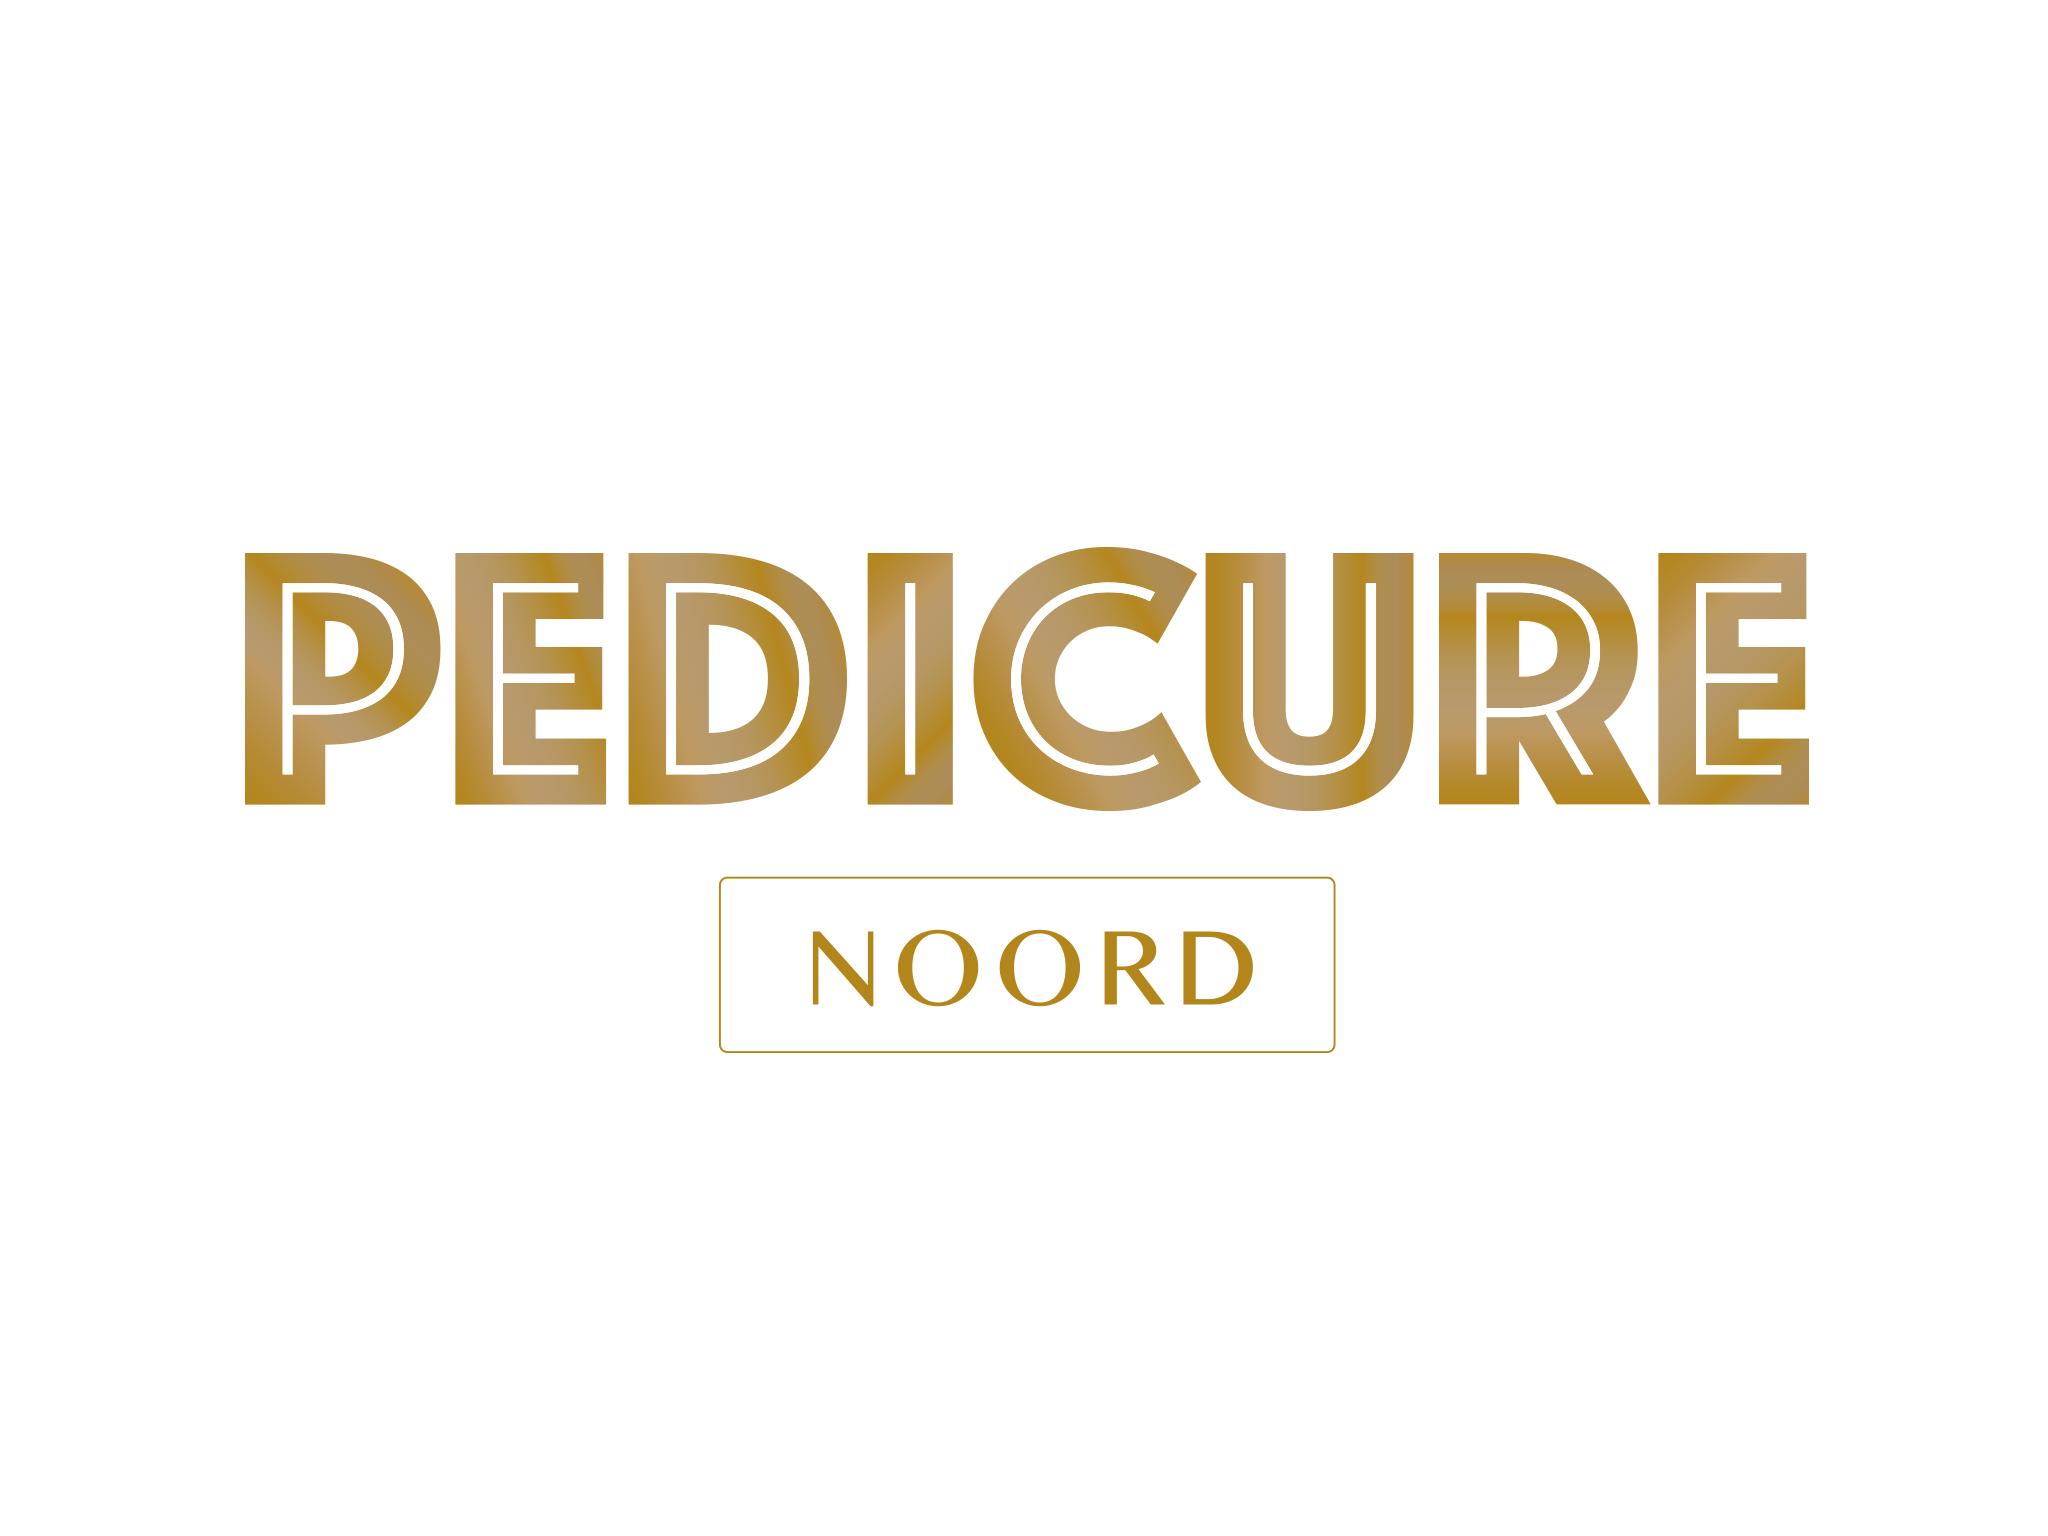 Pedicure Noord Amsterdam